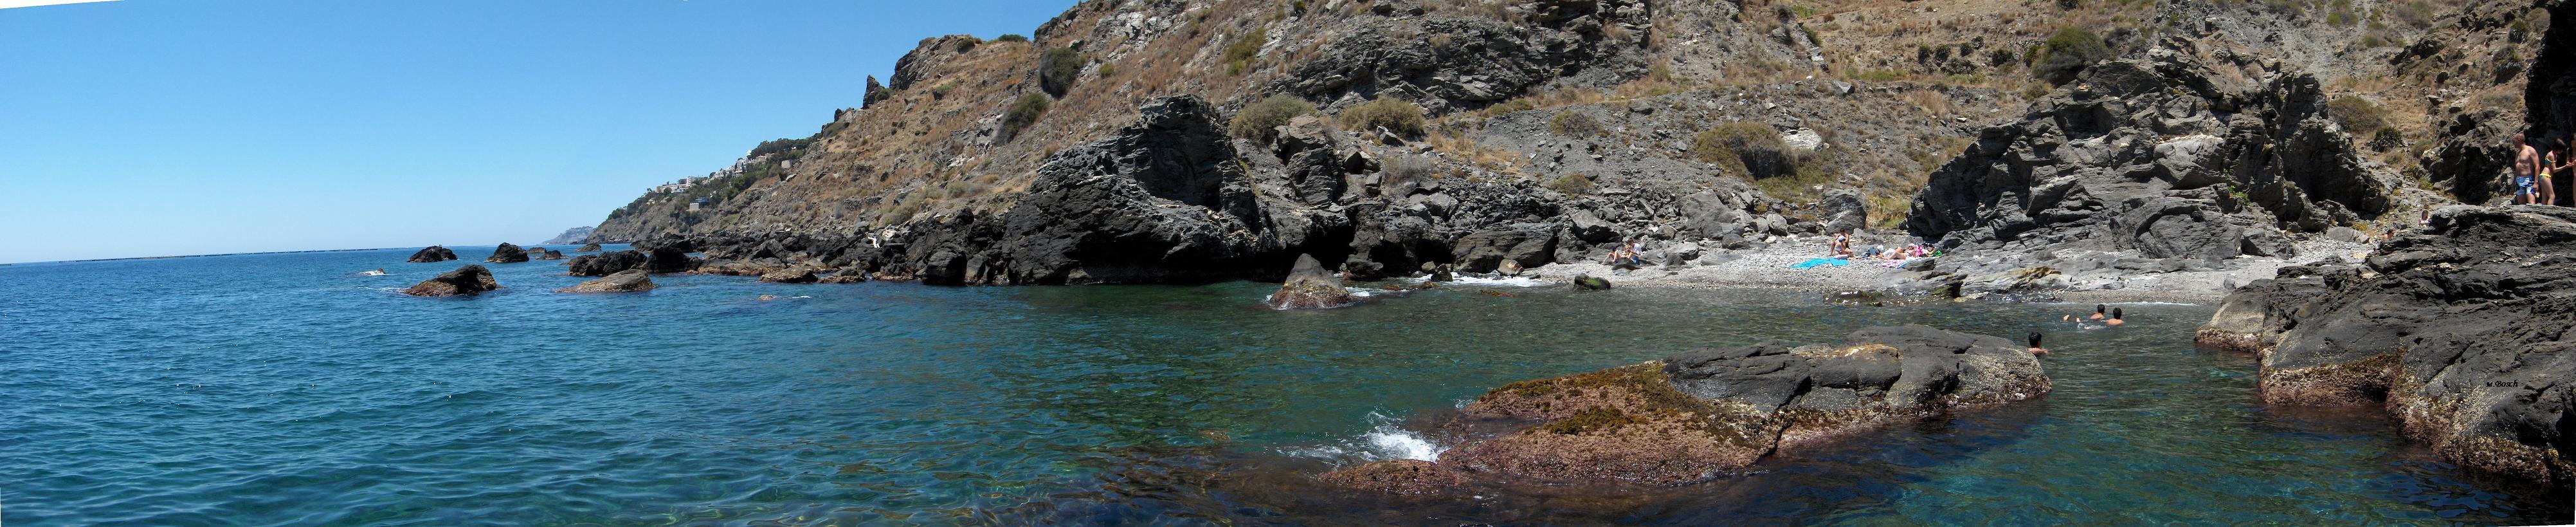 Foto playa La Guardia. El Caletón(salobreña)